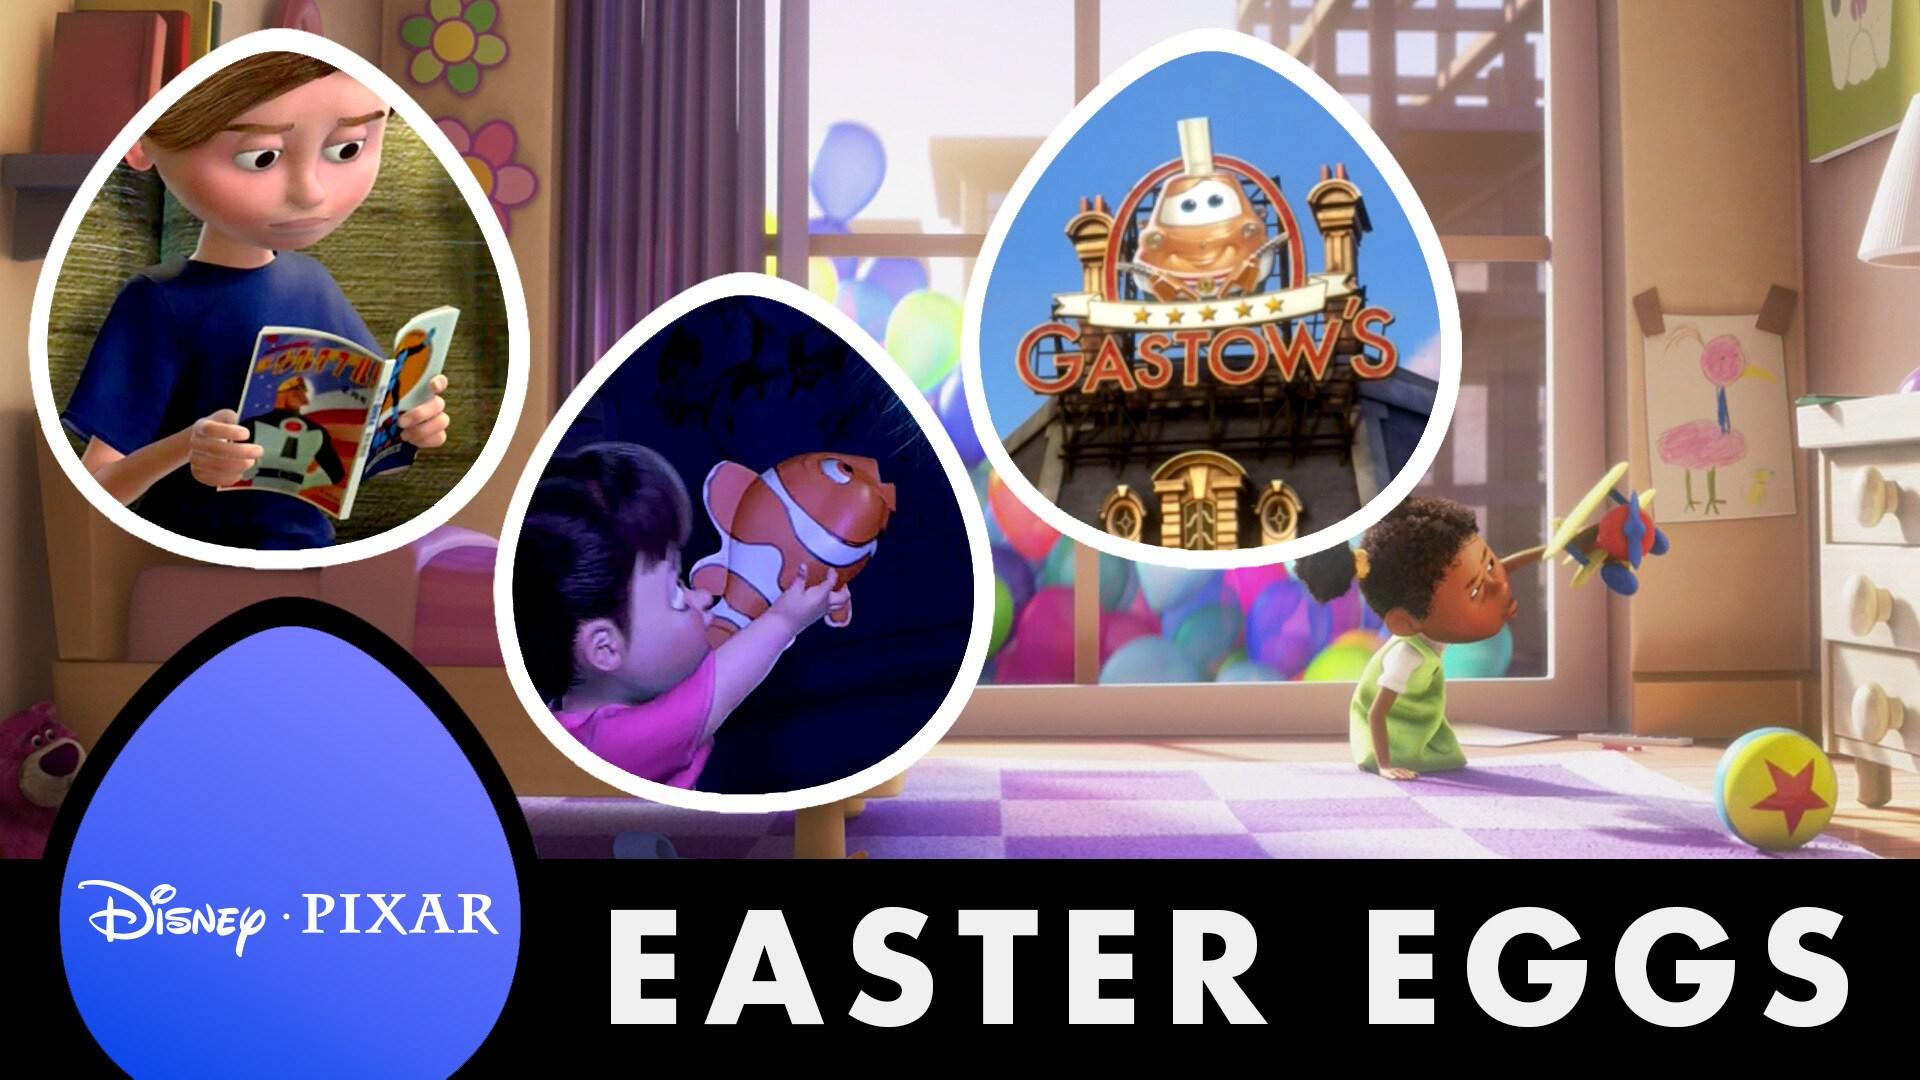 More of the Best Pixar Easter Eggs - Oh My Disney